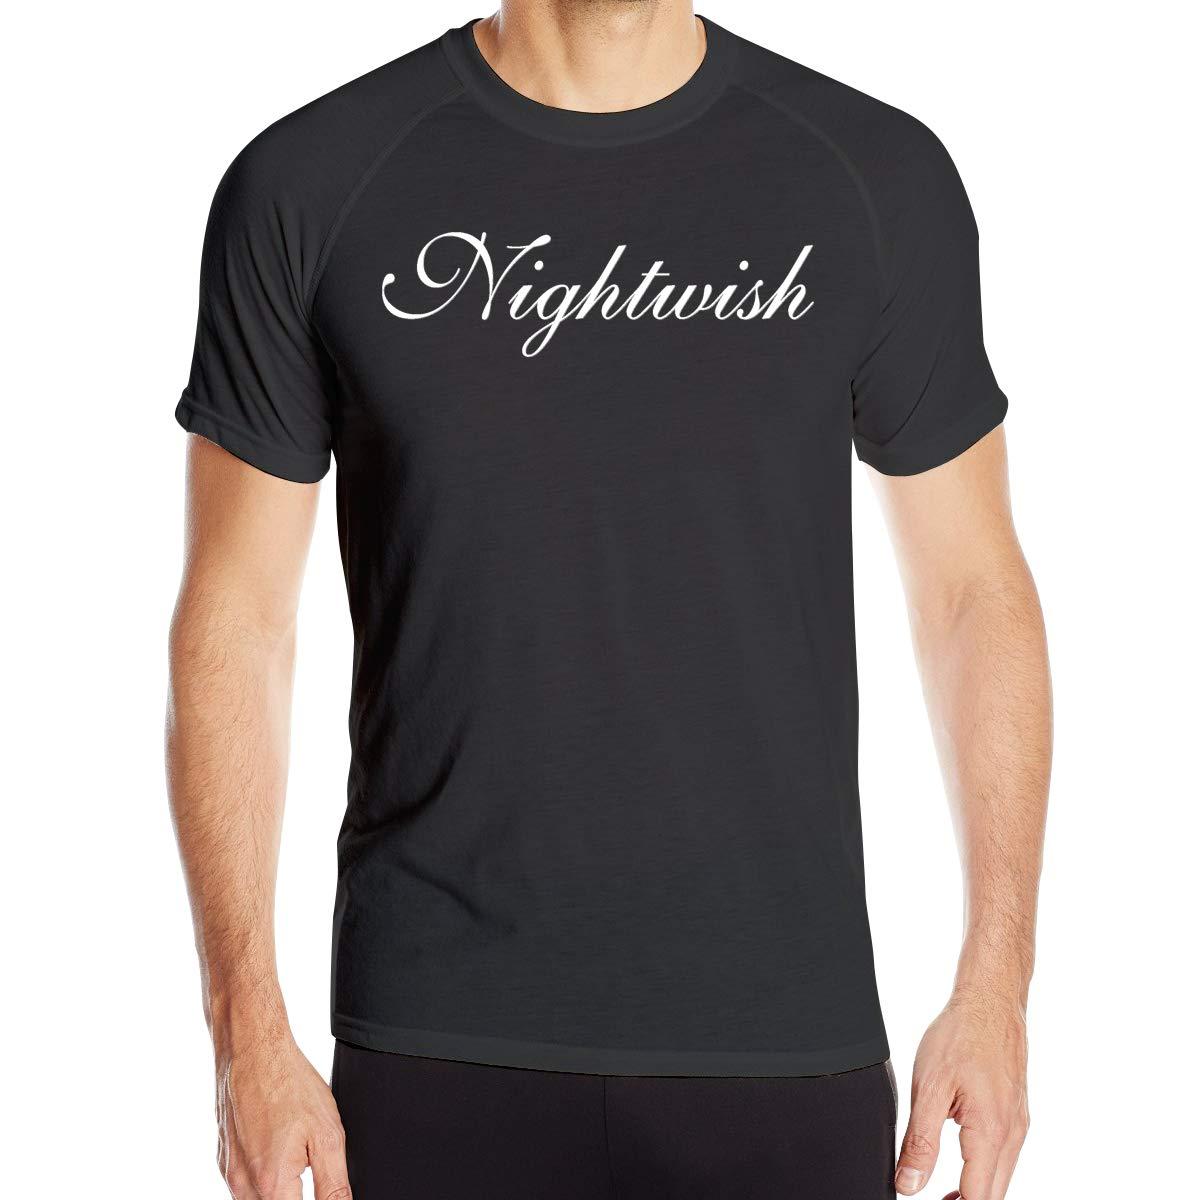 Nightwish Mans Sports Short Sleeve Tee M Black